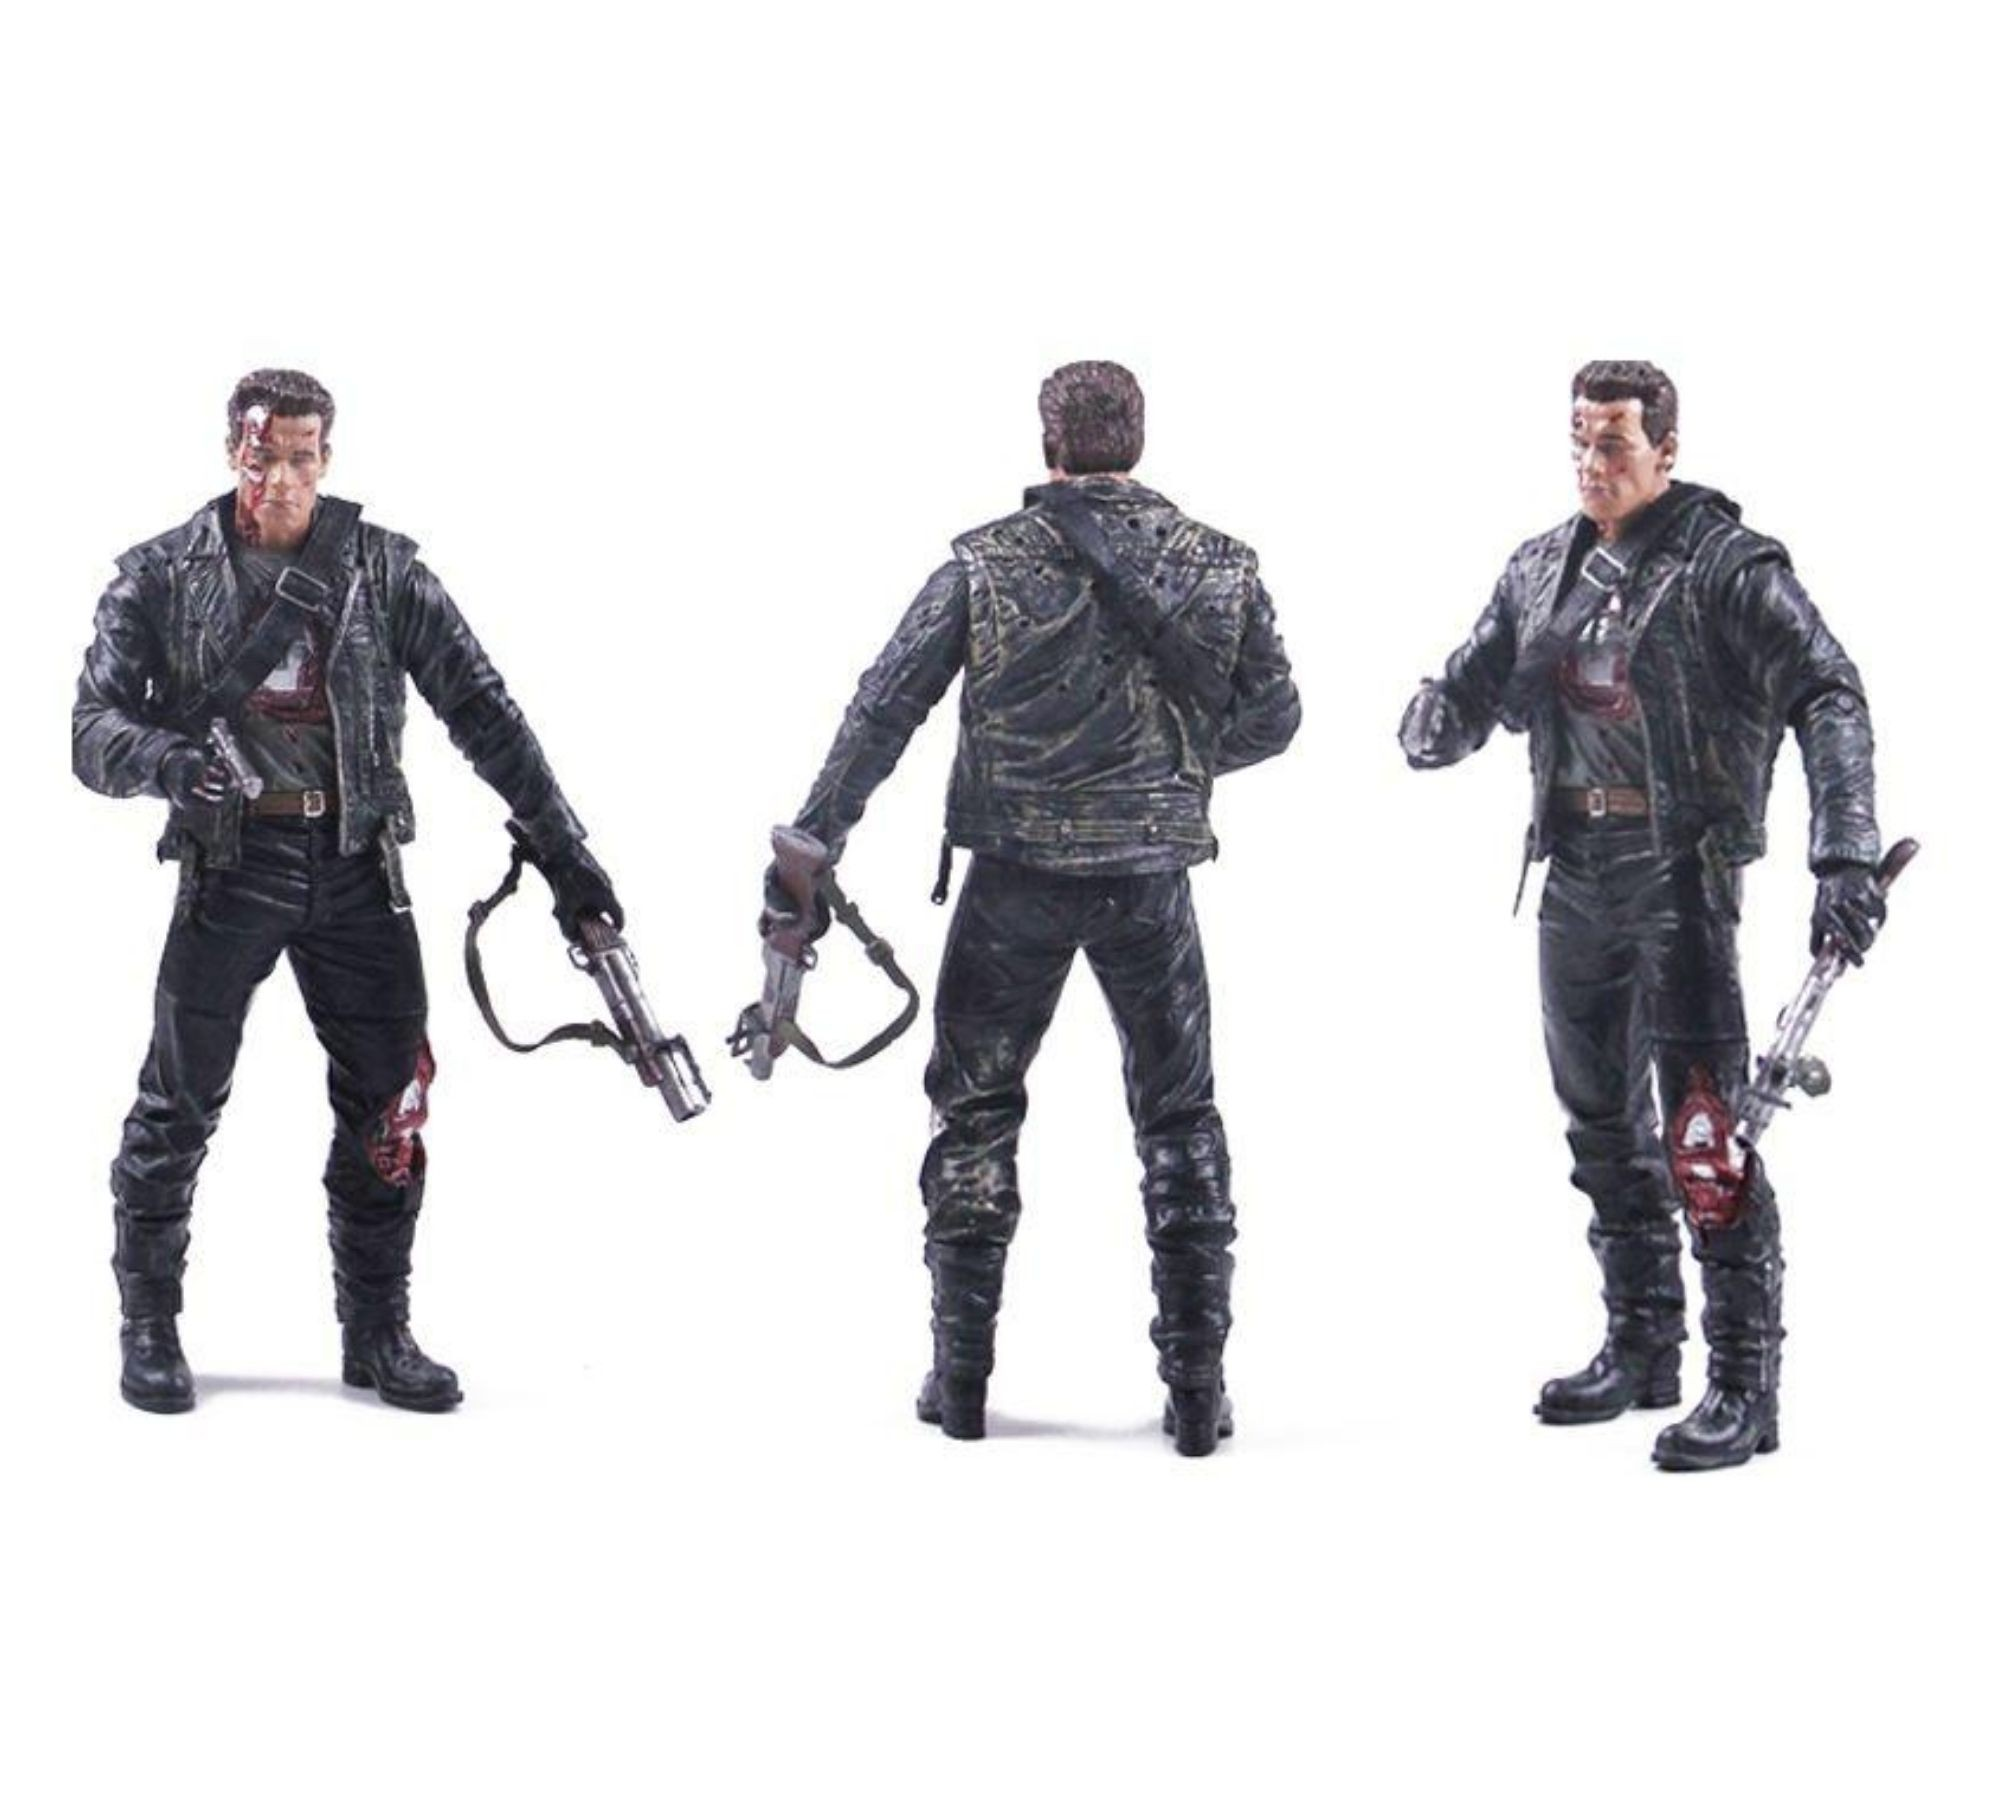 Boneco Terminator T-800 Steel Mill Exterminador do Futuro Neca 18 cm  - Game Land Brinquedos